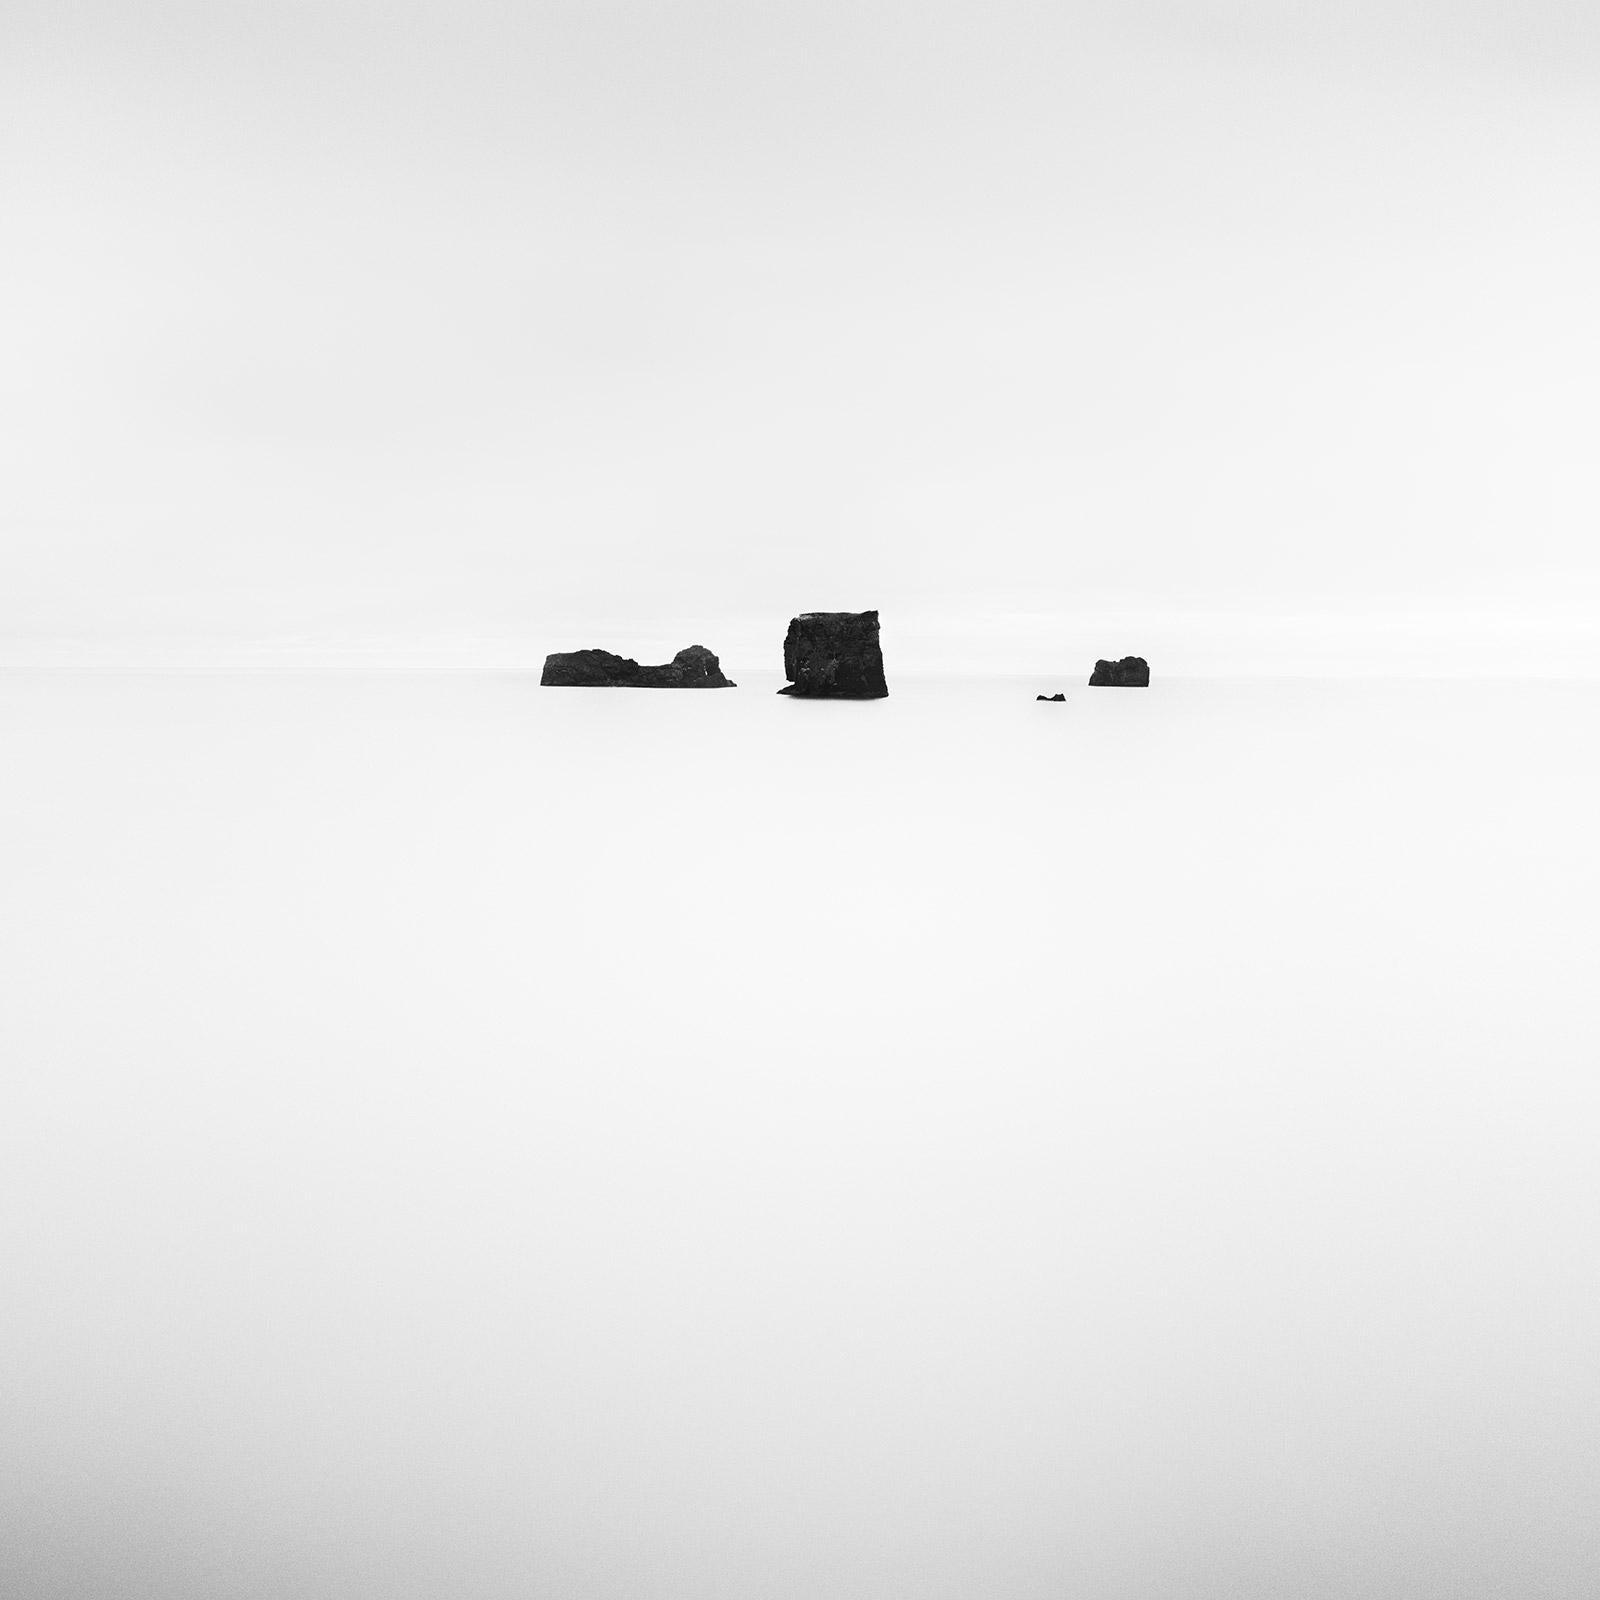 Black Rocks, Iceland, minimalist black and white fine art landscape photography